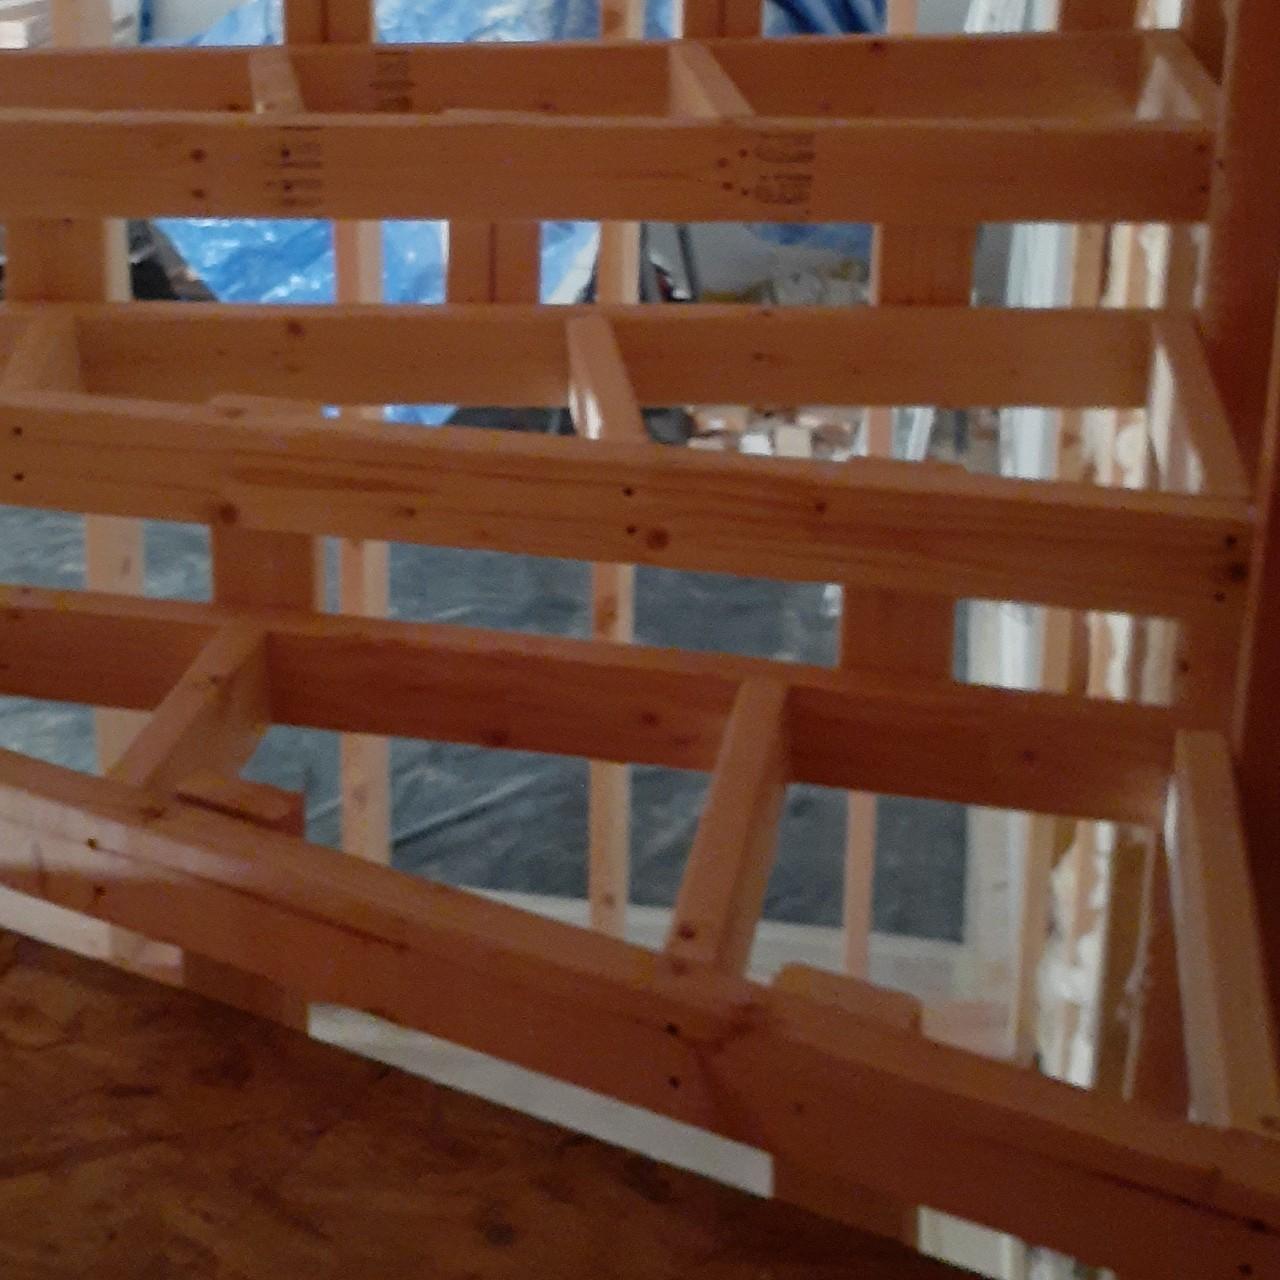 carpentry-wood-framing-second-floor-home-addition--framing-28